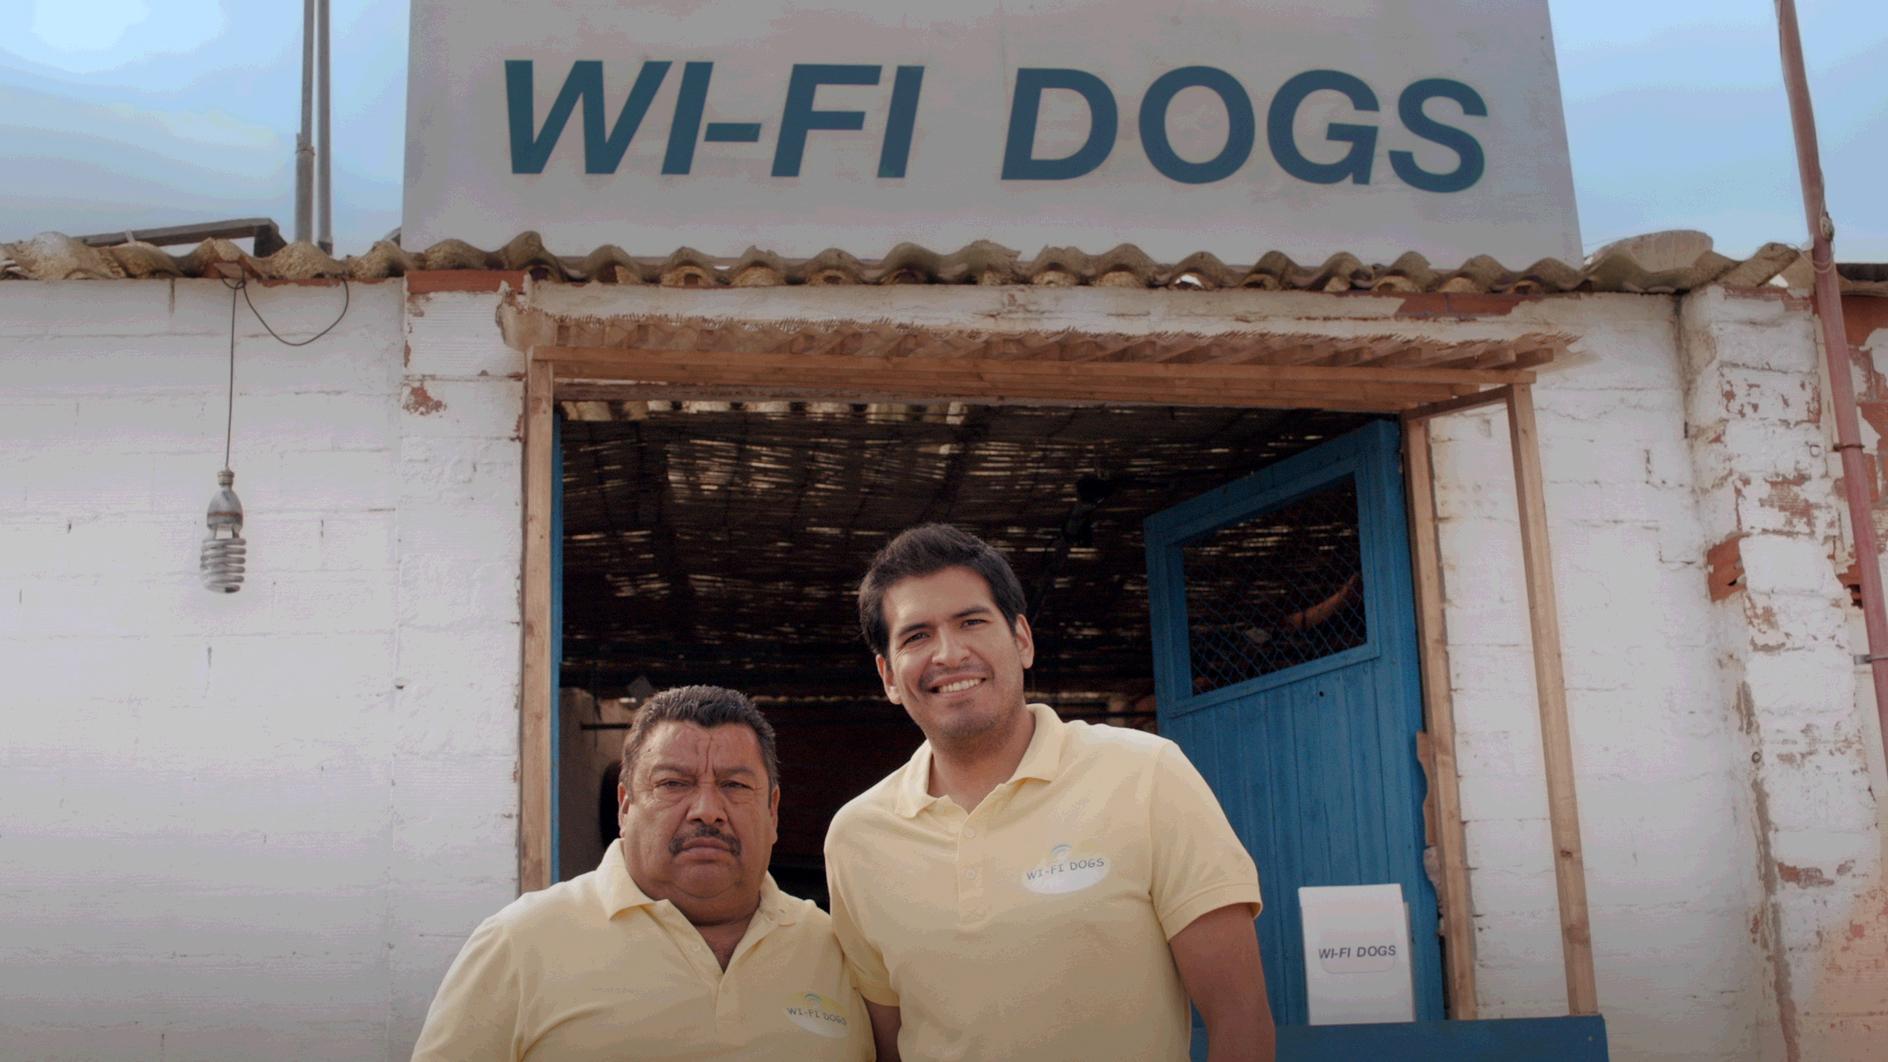 Wifi dogs